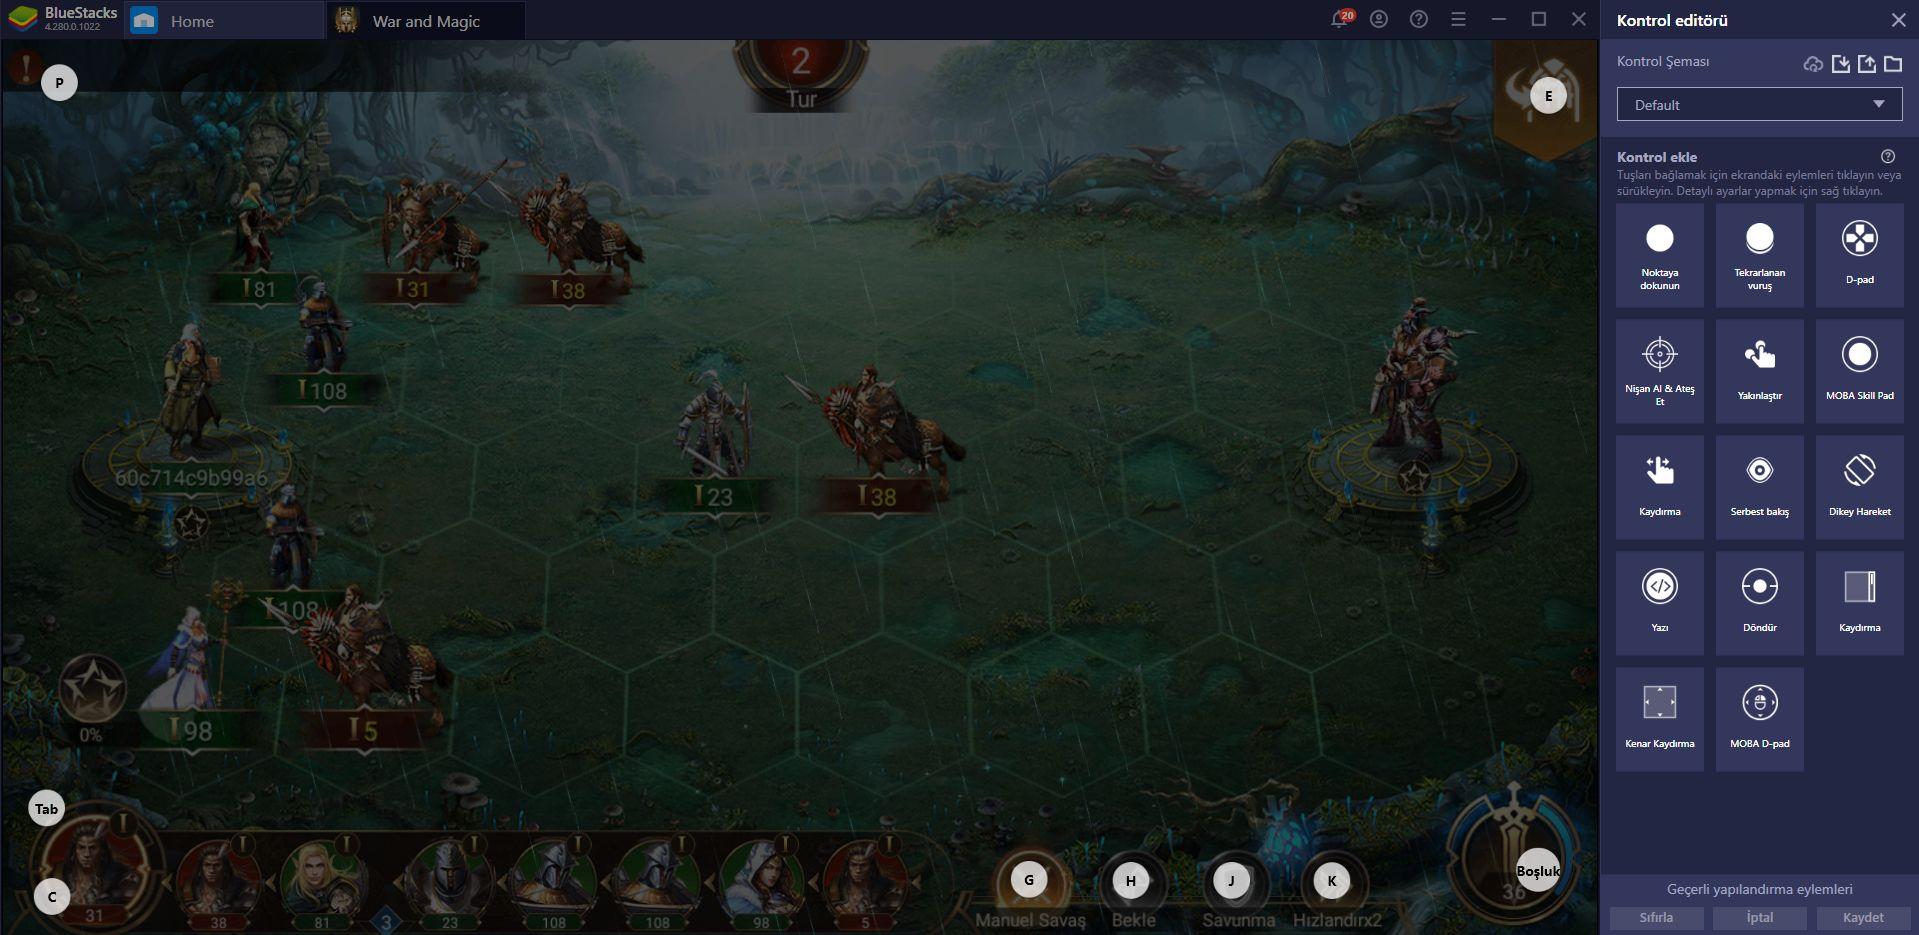 War and Magic: BlueStacks Kurulum Rehberi